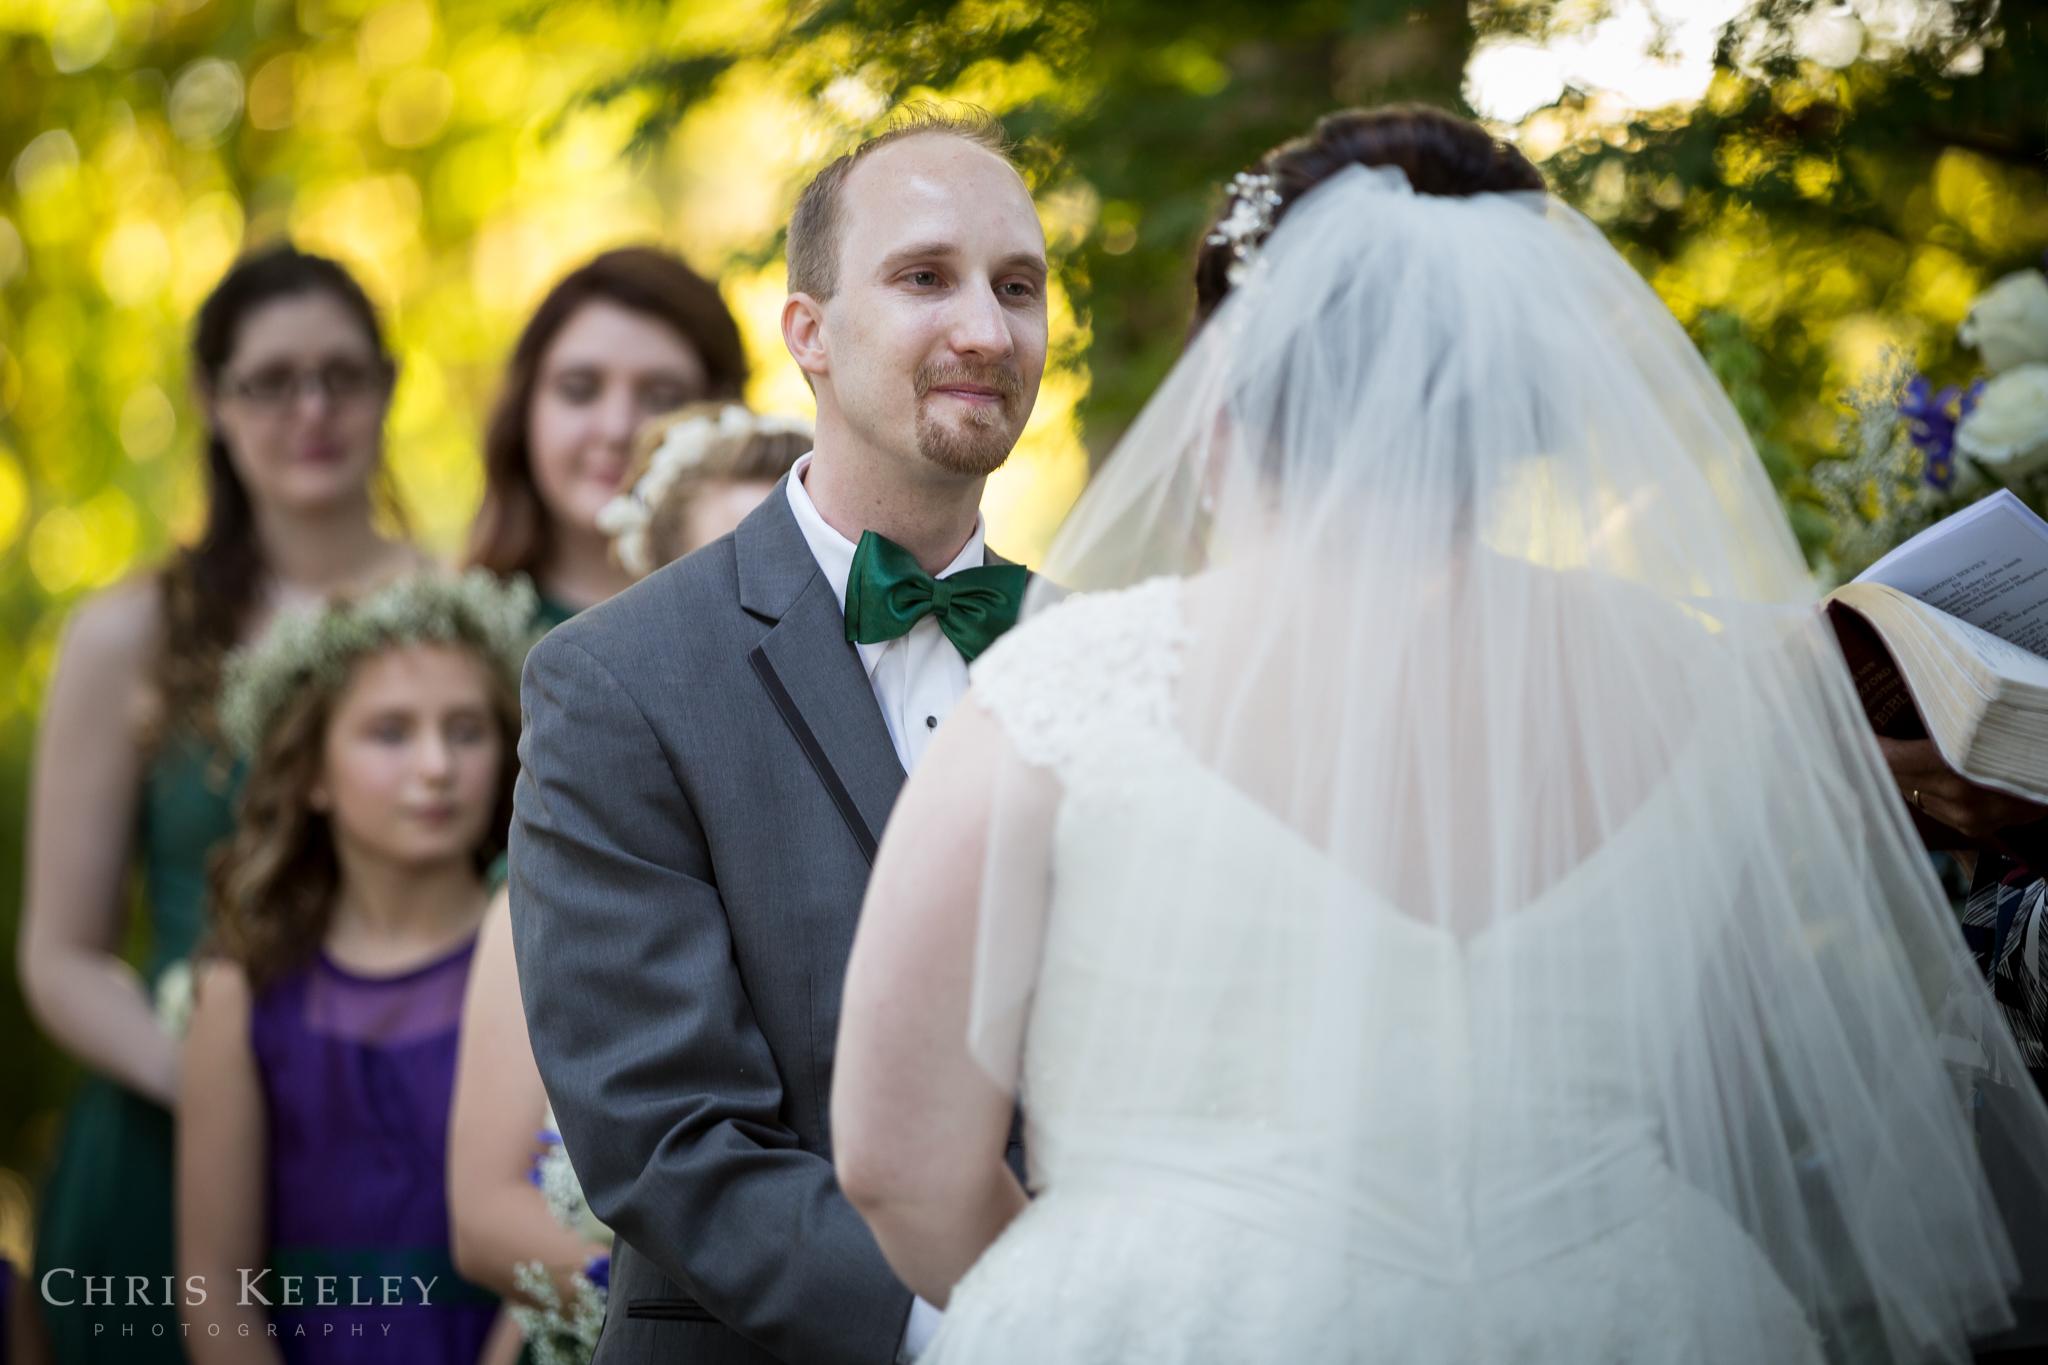 new-hampshire-wedding-photographer-three-chimneys-inn-chris-keeley-photography-14.jpg